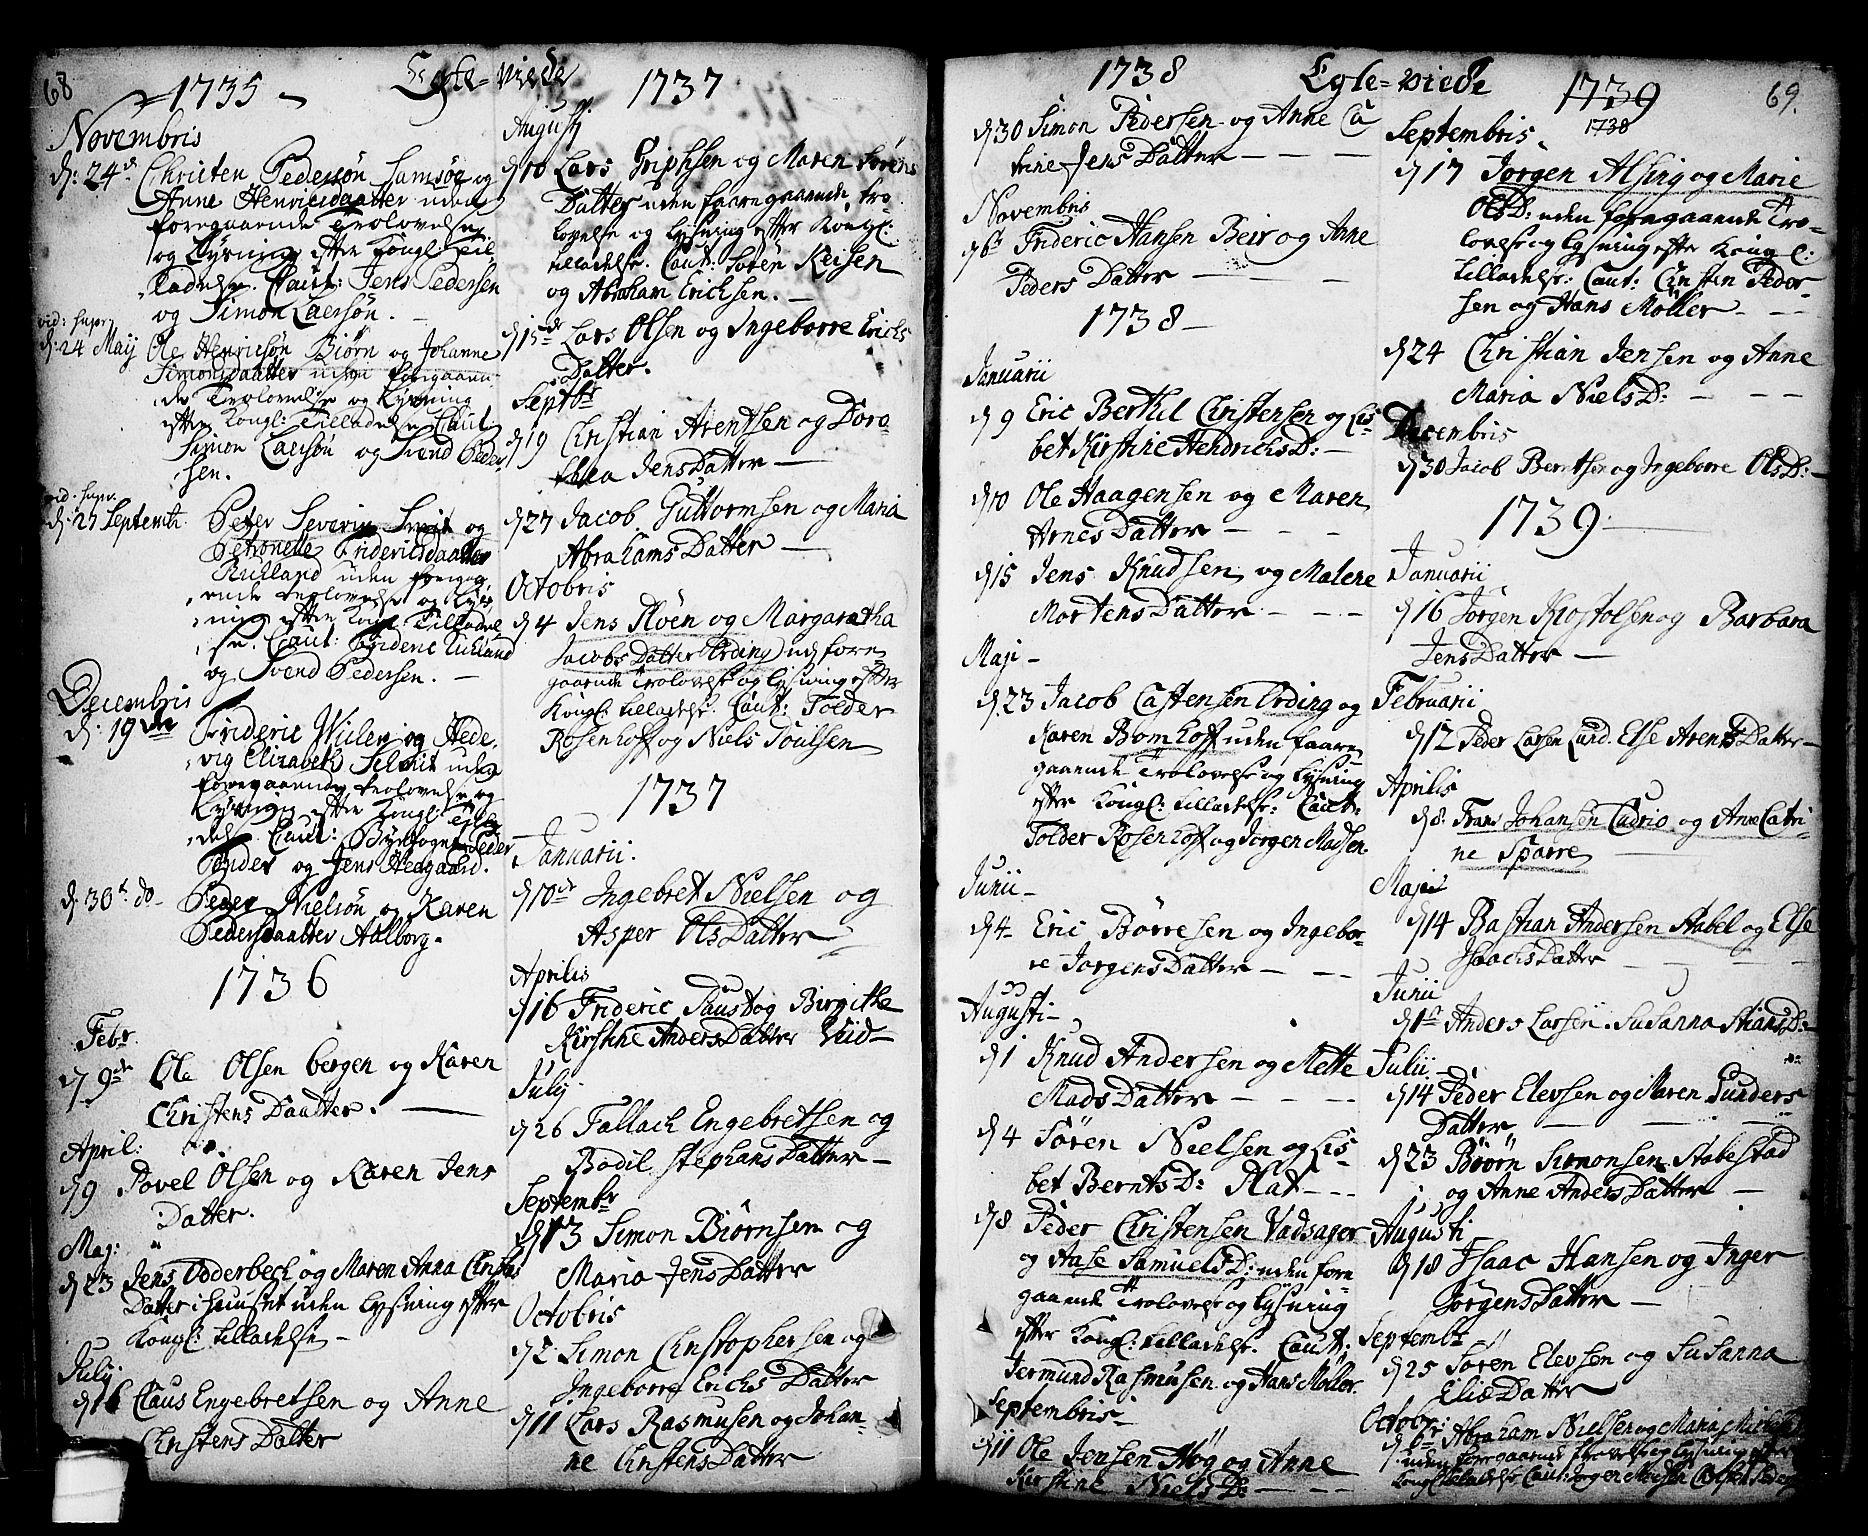 SAKO, Kragerø kirkebøker, F/Fa/L0001: Ministerialbok nr. 1, 1702-1766, s. 68-69